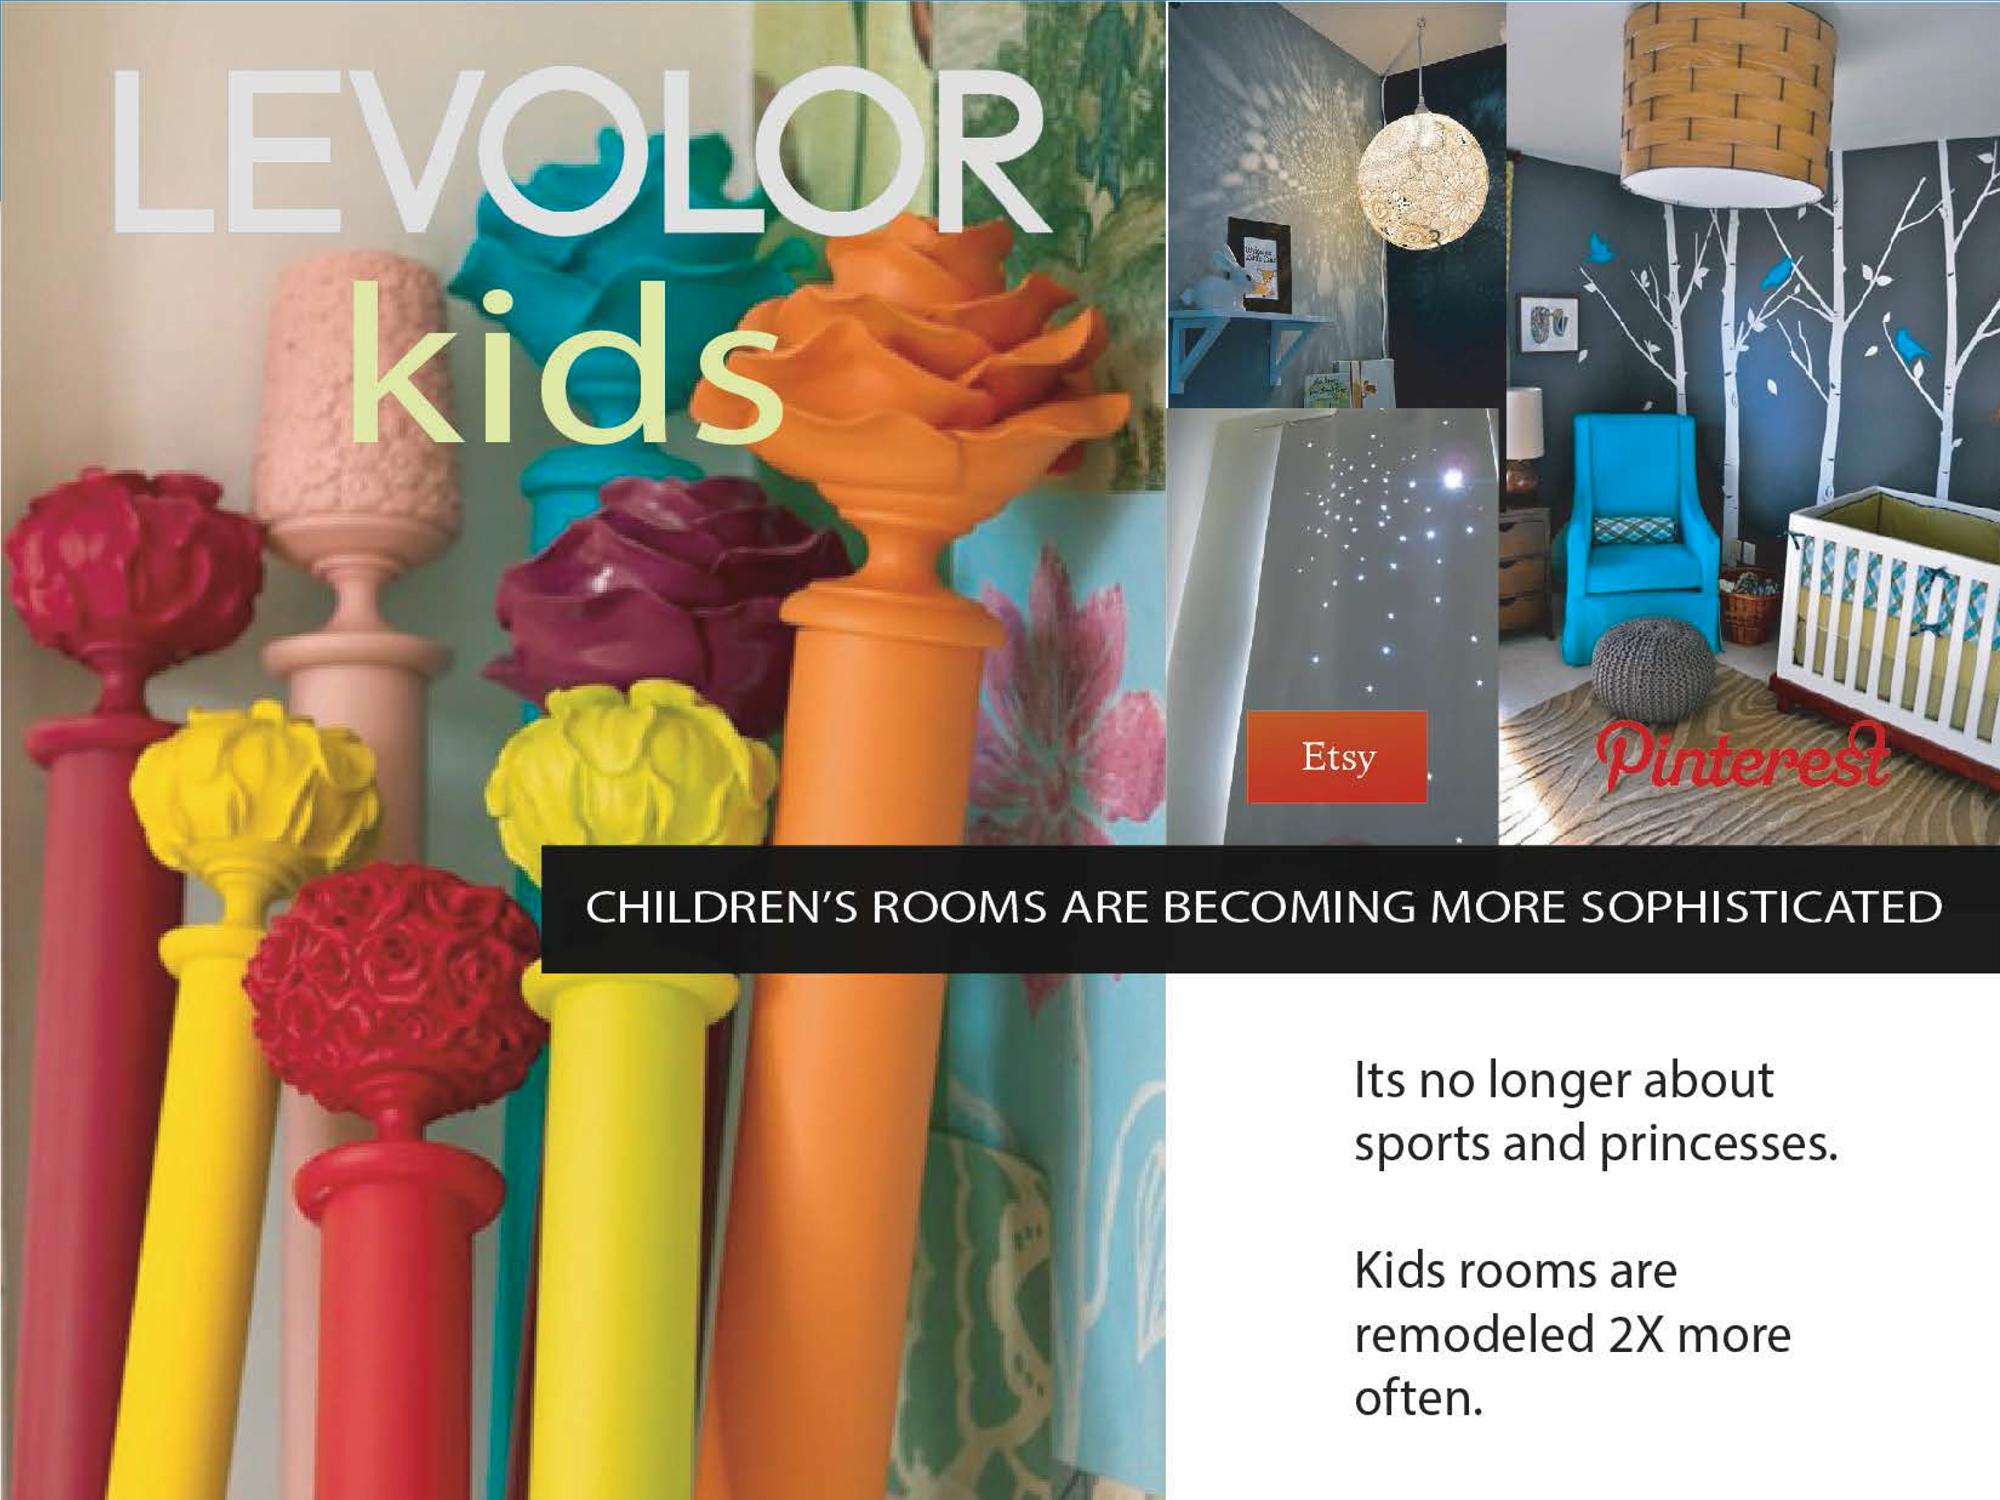 Levolor Kids.jpg